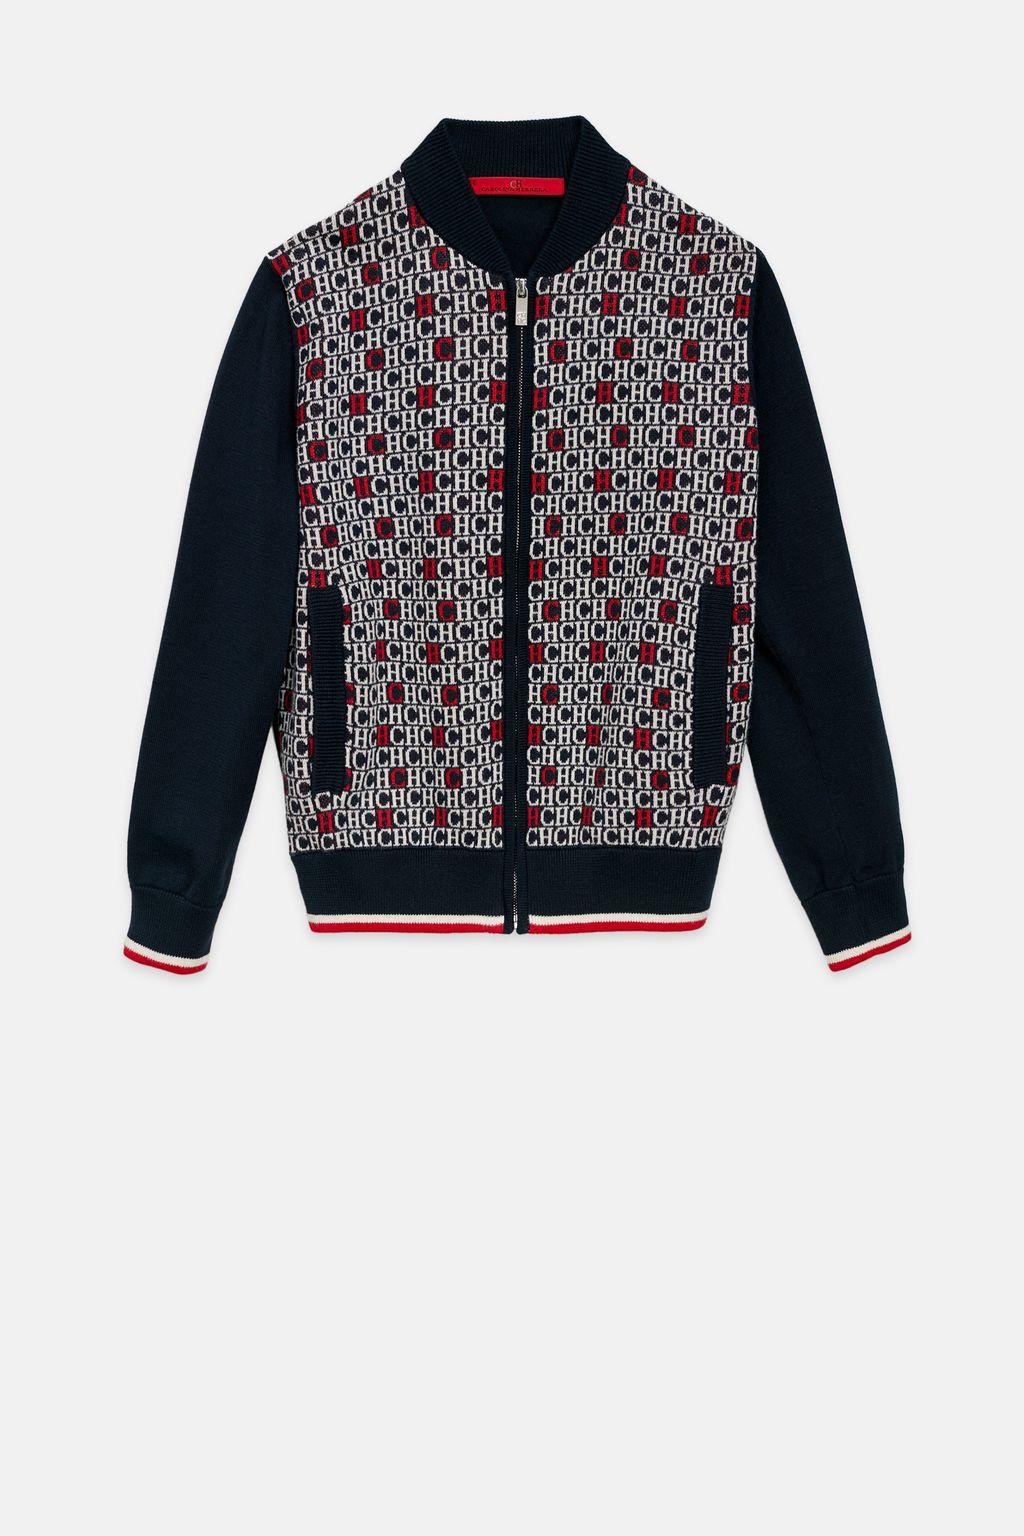 CH jacquard bomber jacket